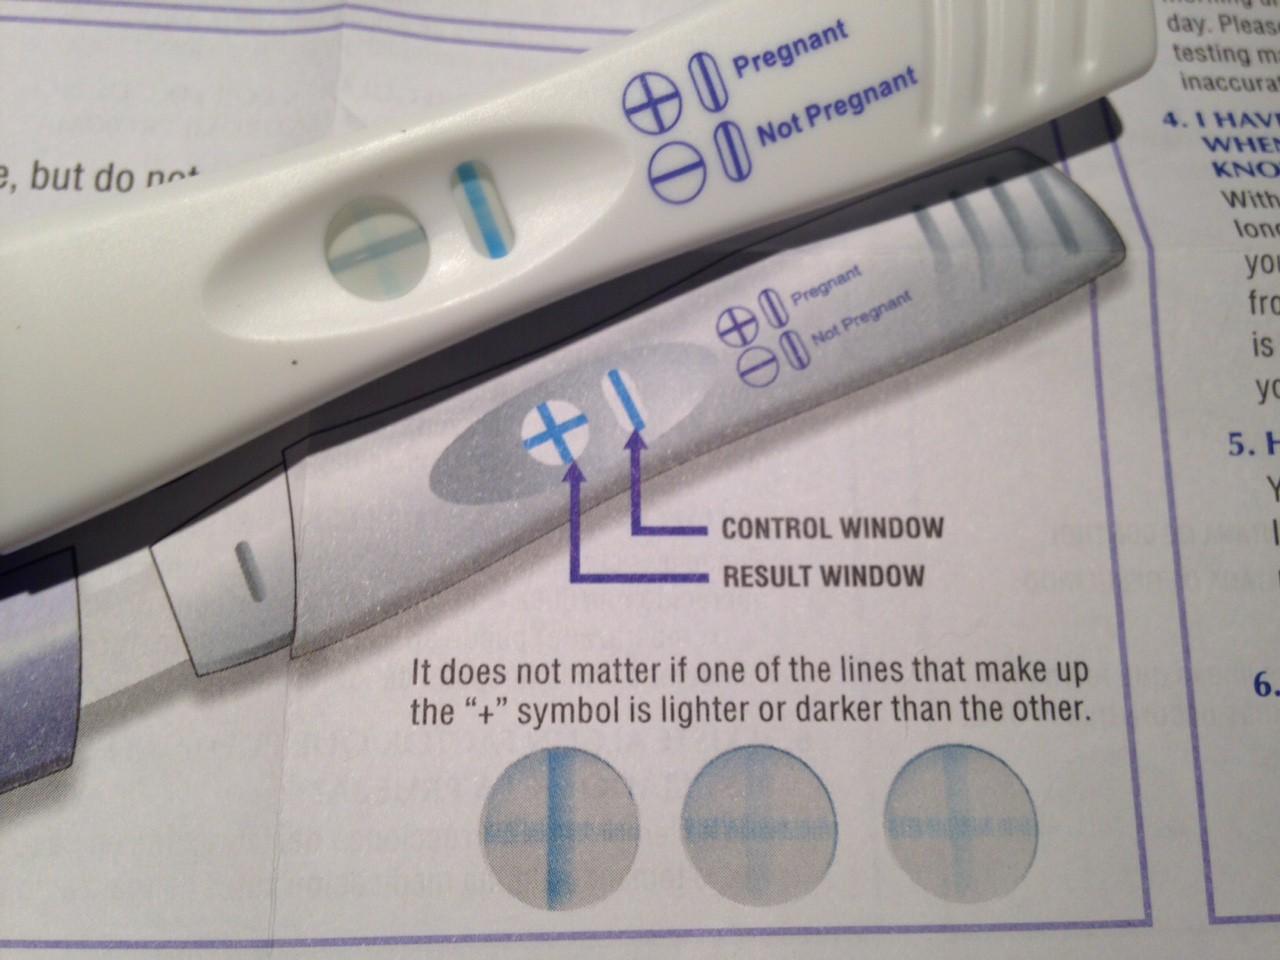 innovacon pregnancy test instructions